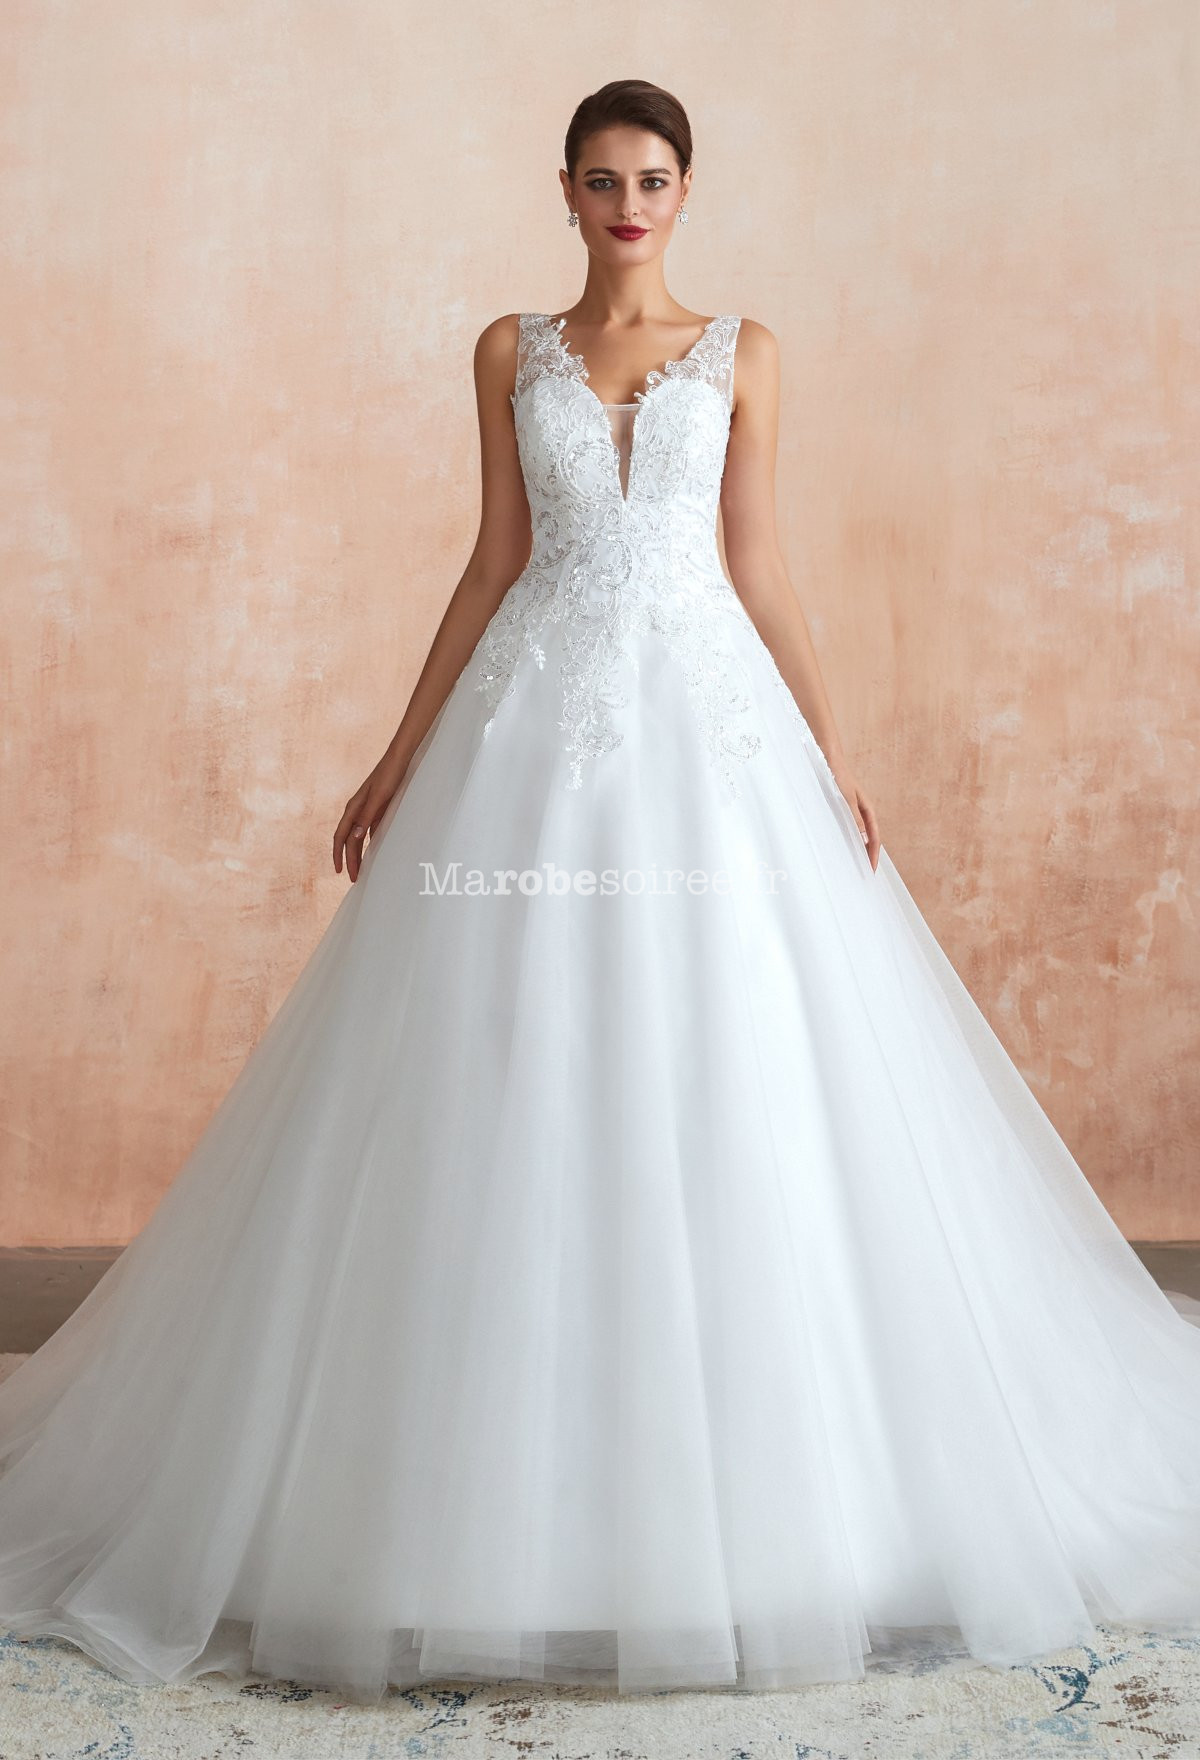 robe mariée princesse strass factory store